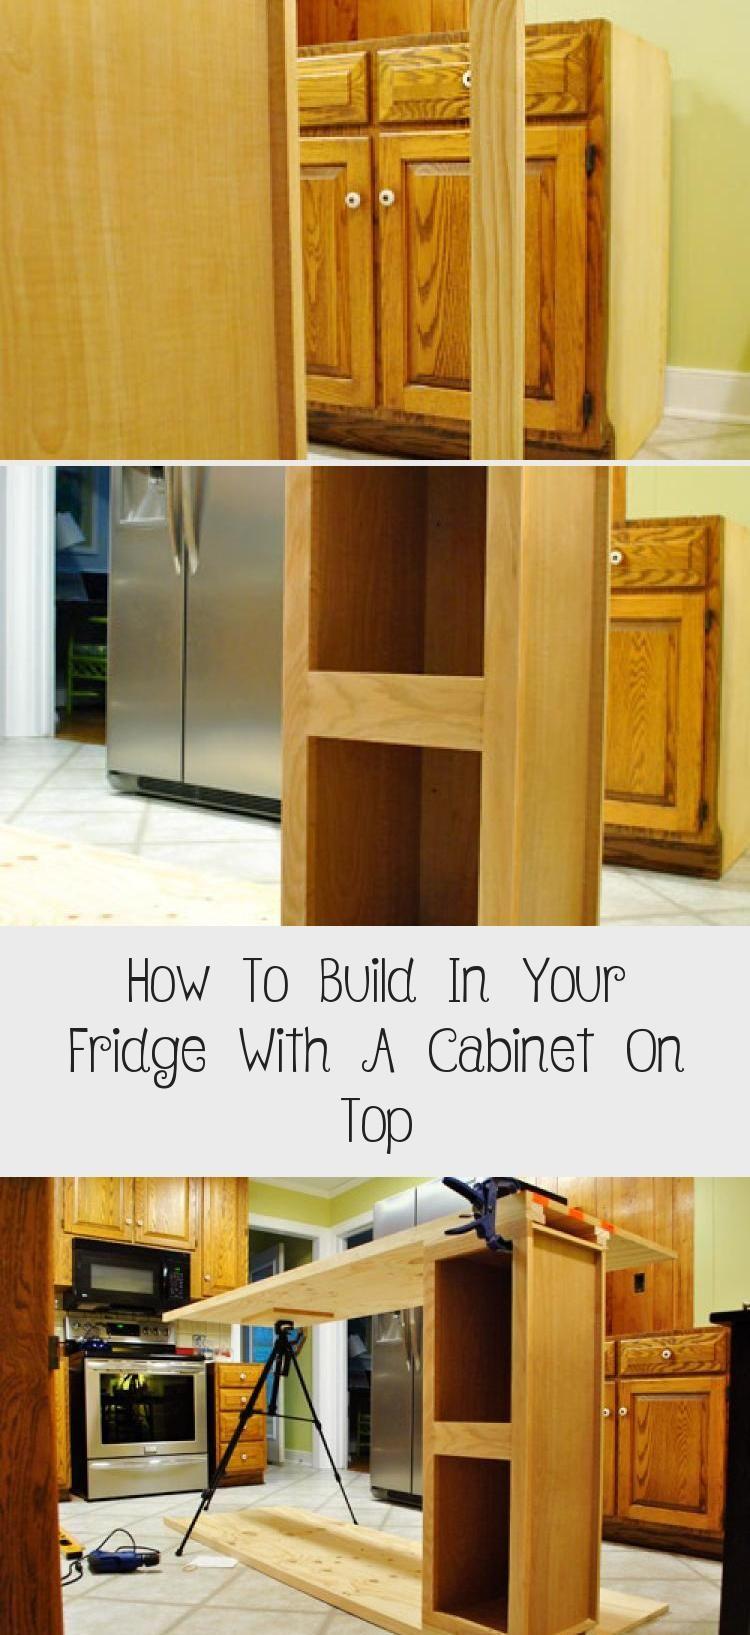 My Blog In 2020 Diy Home Improvement Home Diy Refrigerator Cabinet